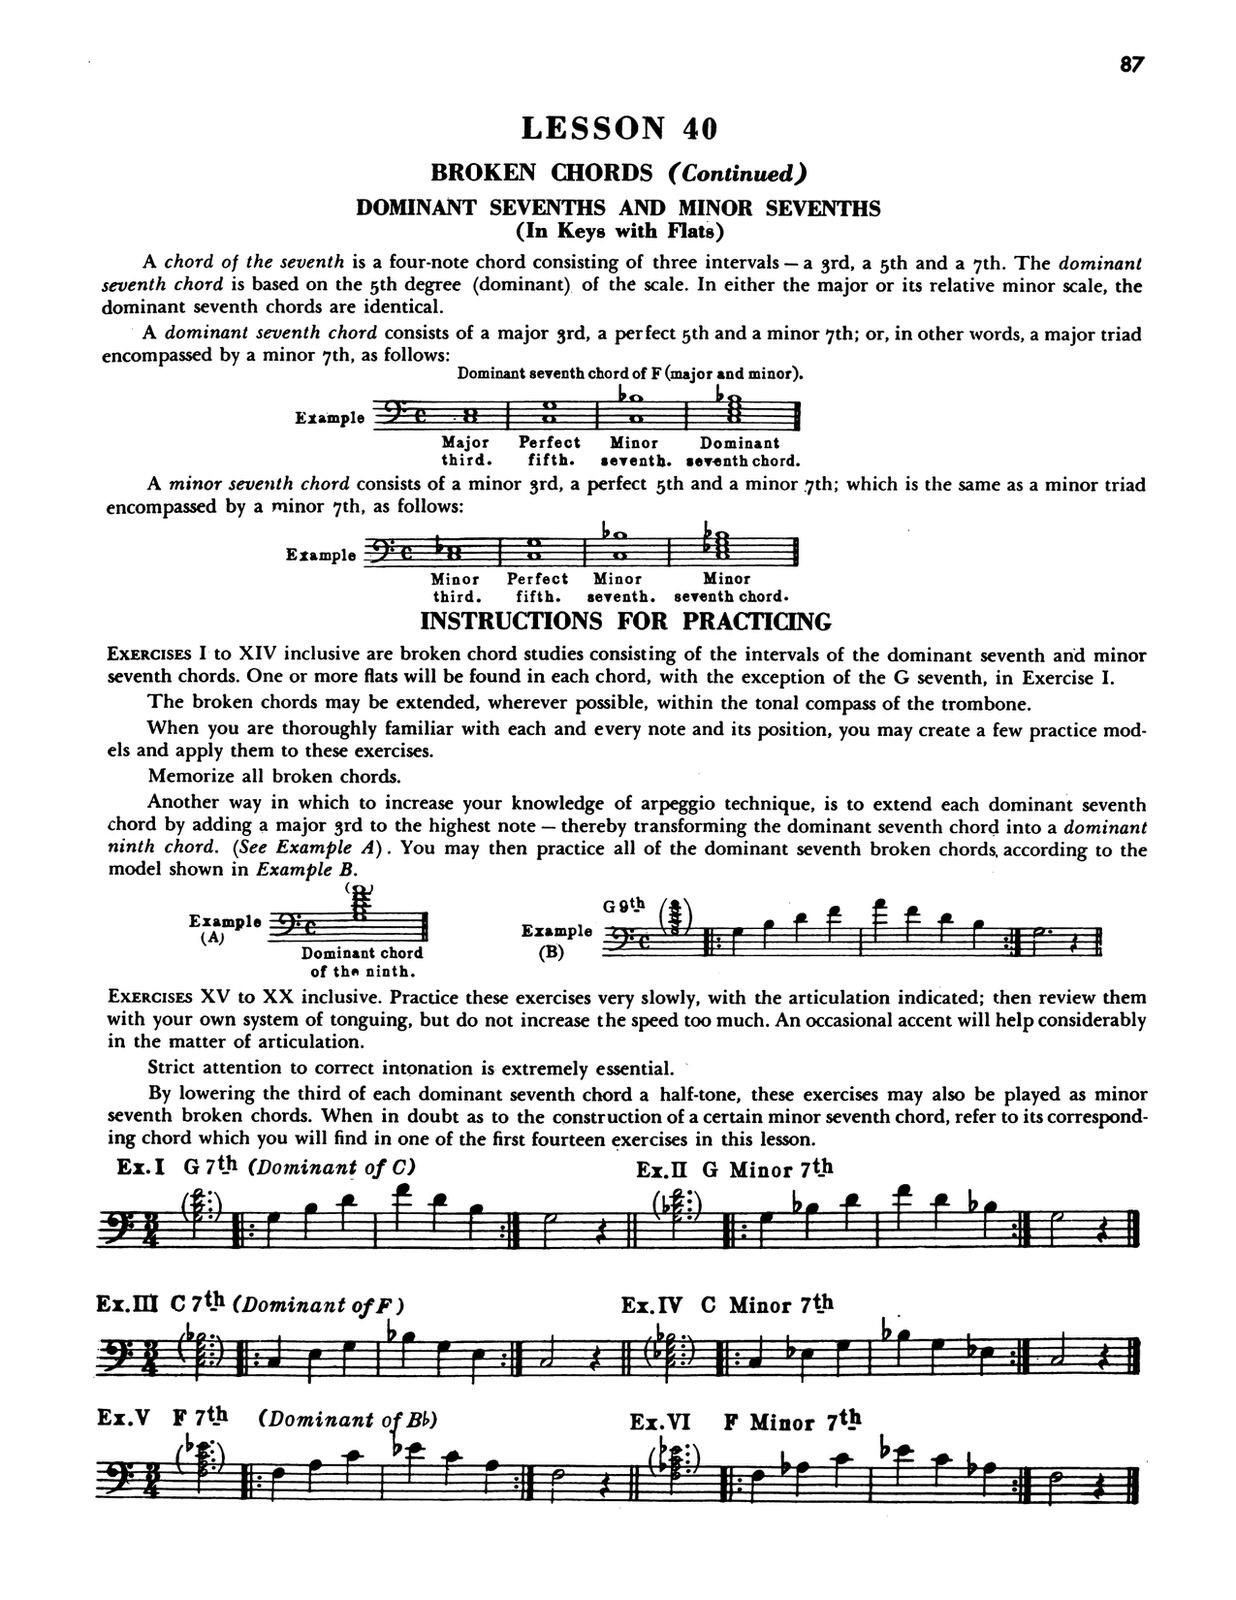 Clean Dorsey, The Modern Trombonist 8